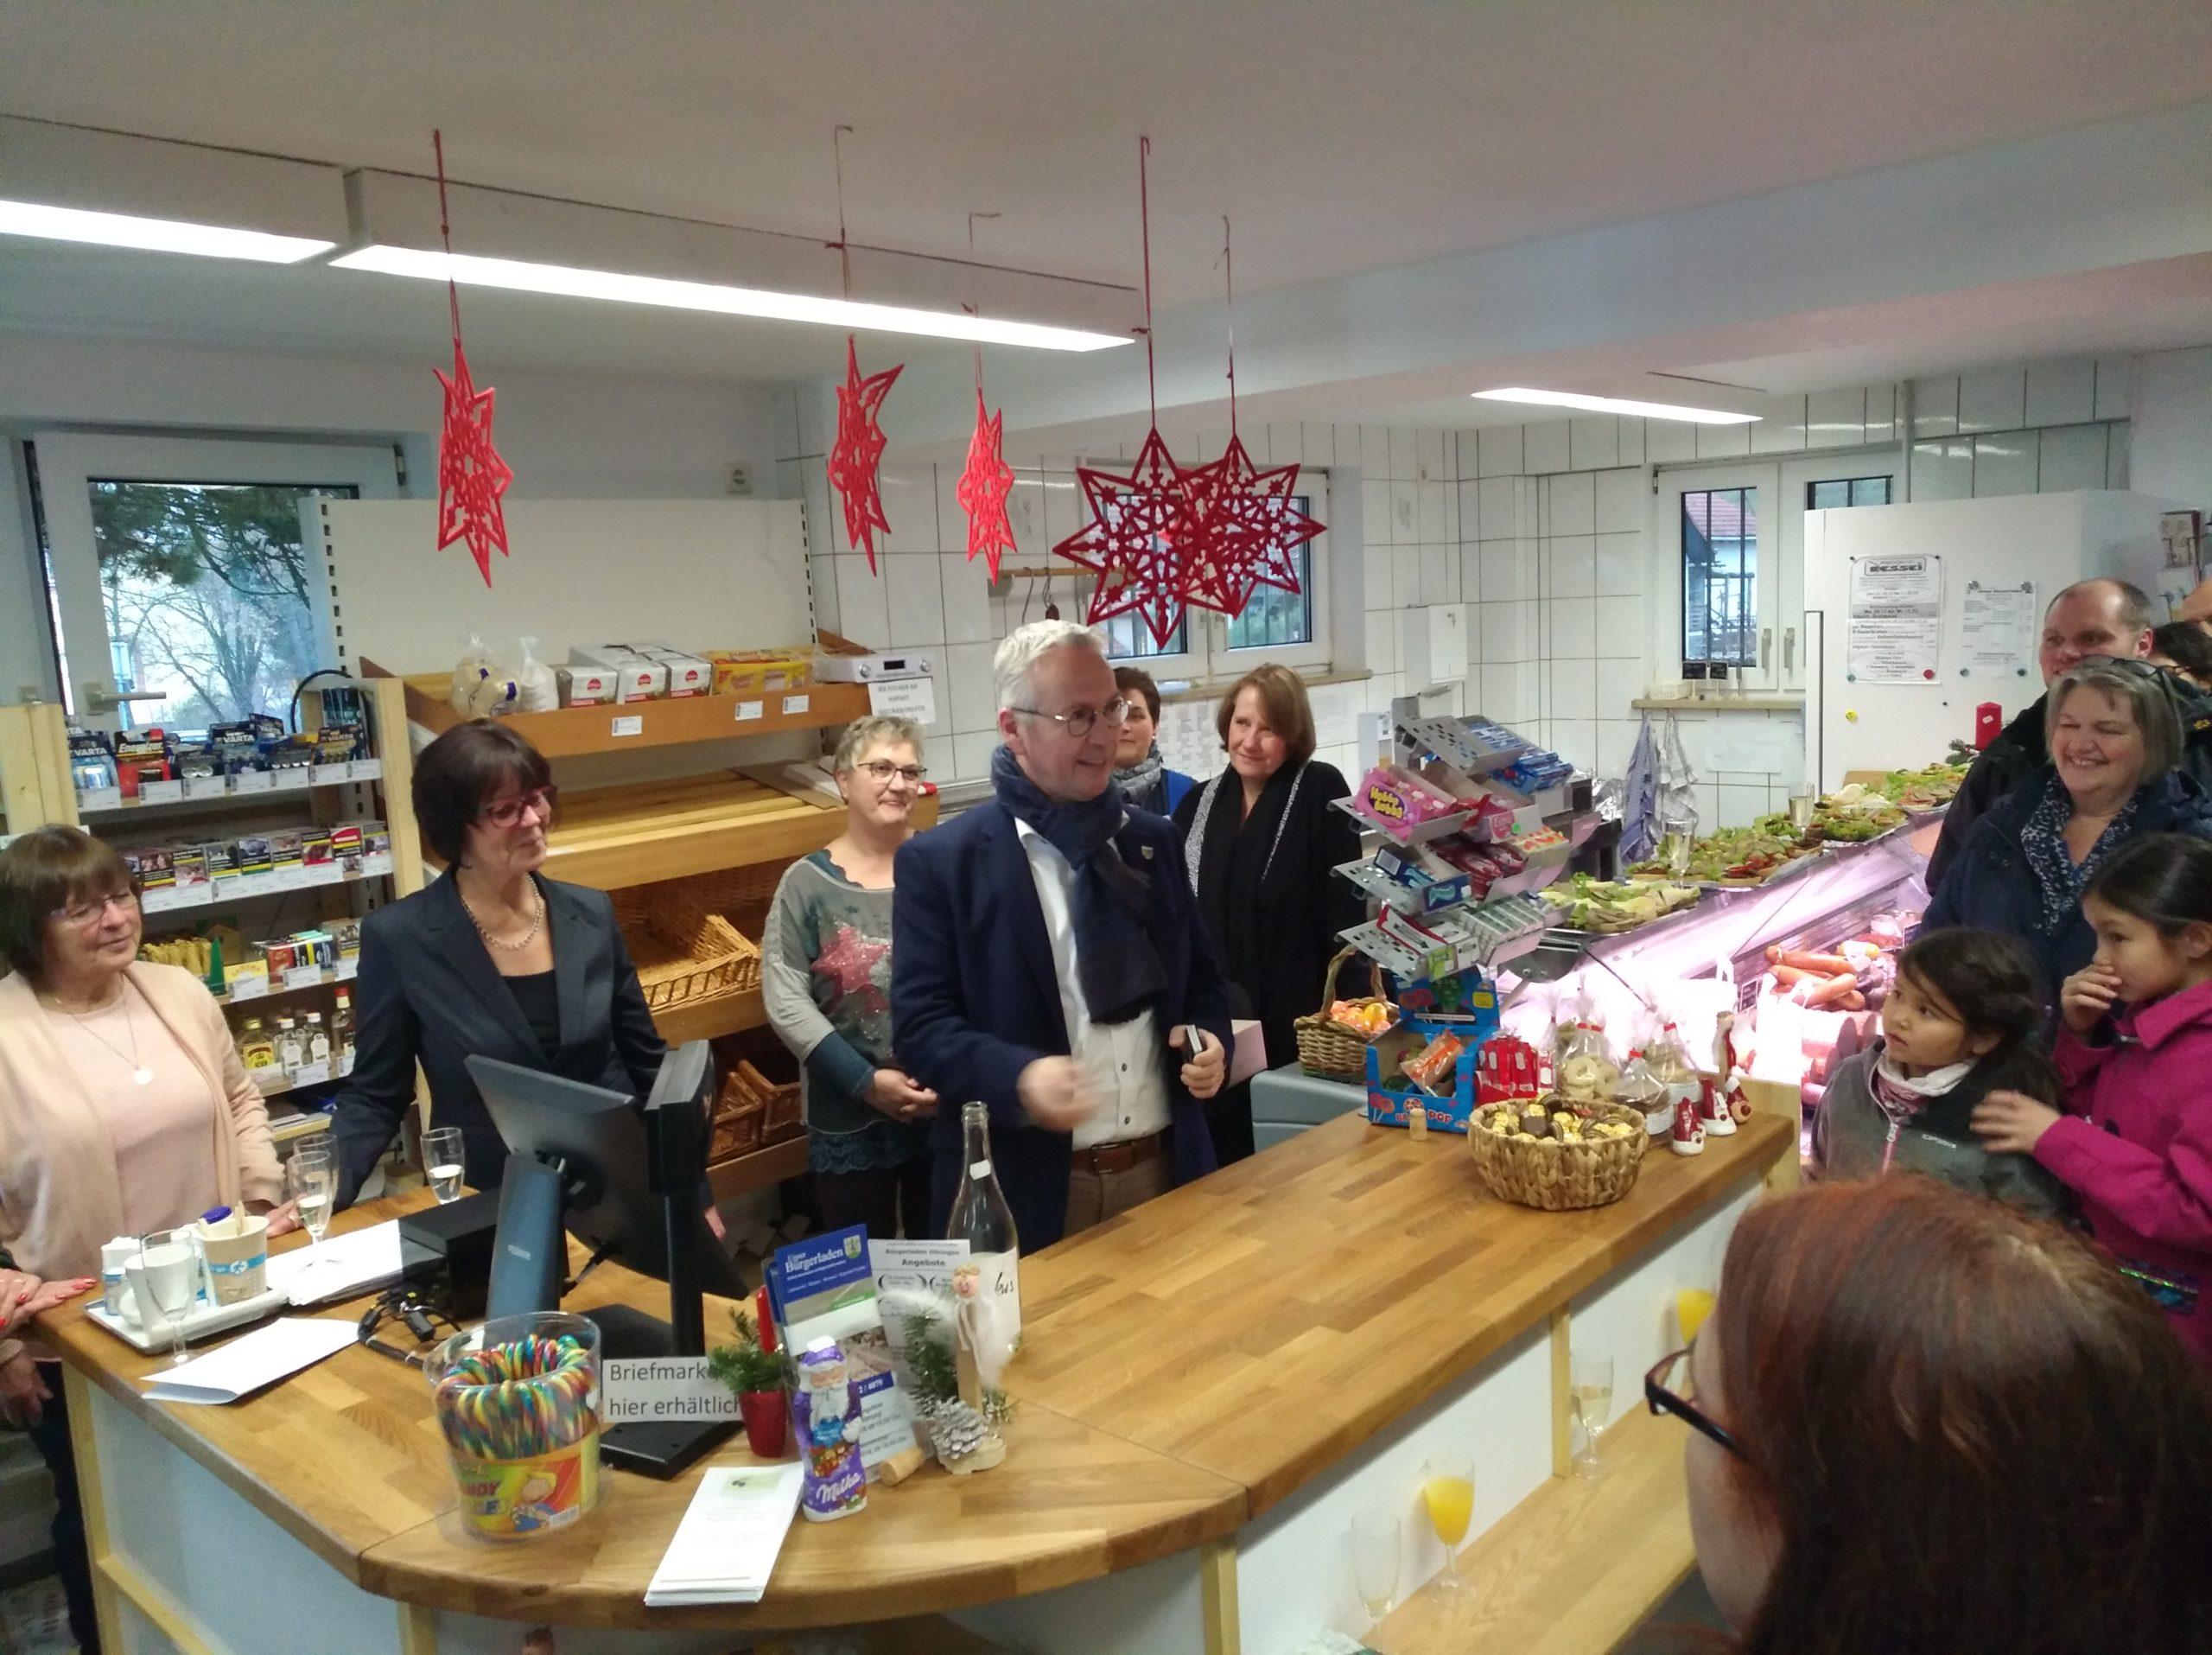 Eröffnung der Bürgerladens in Höringen